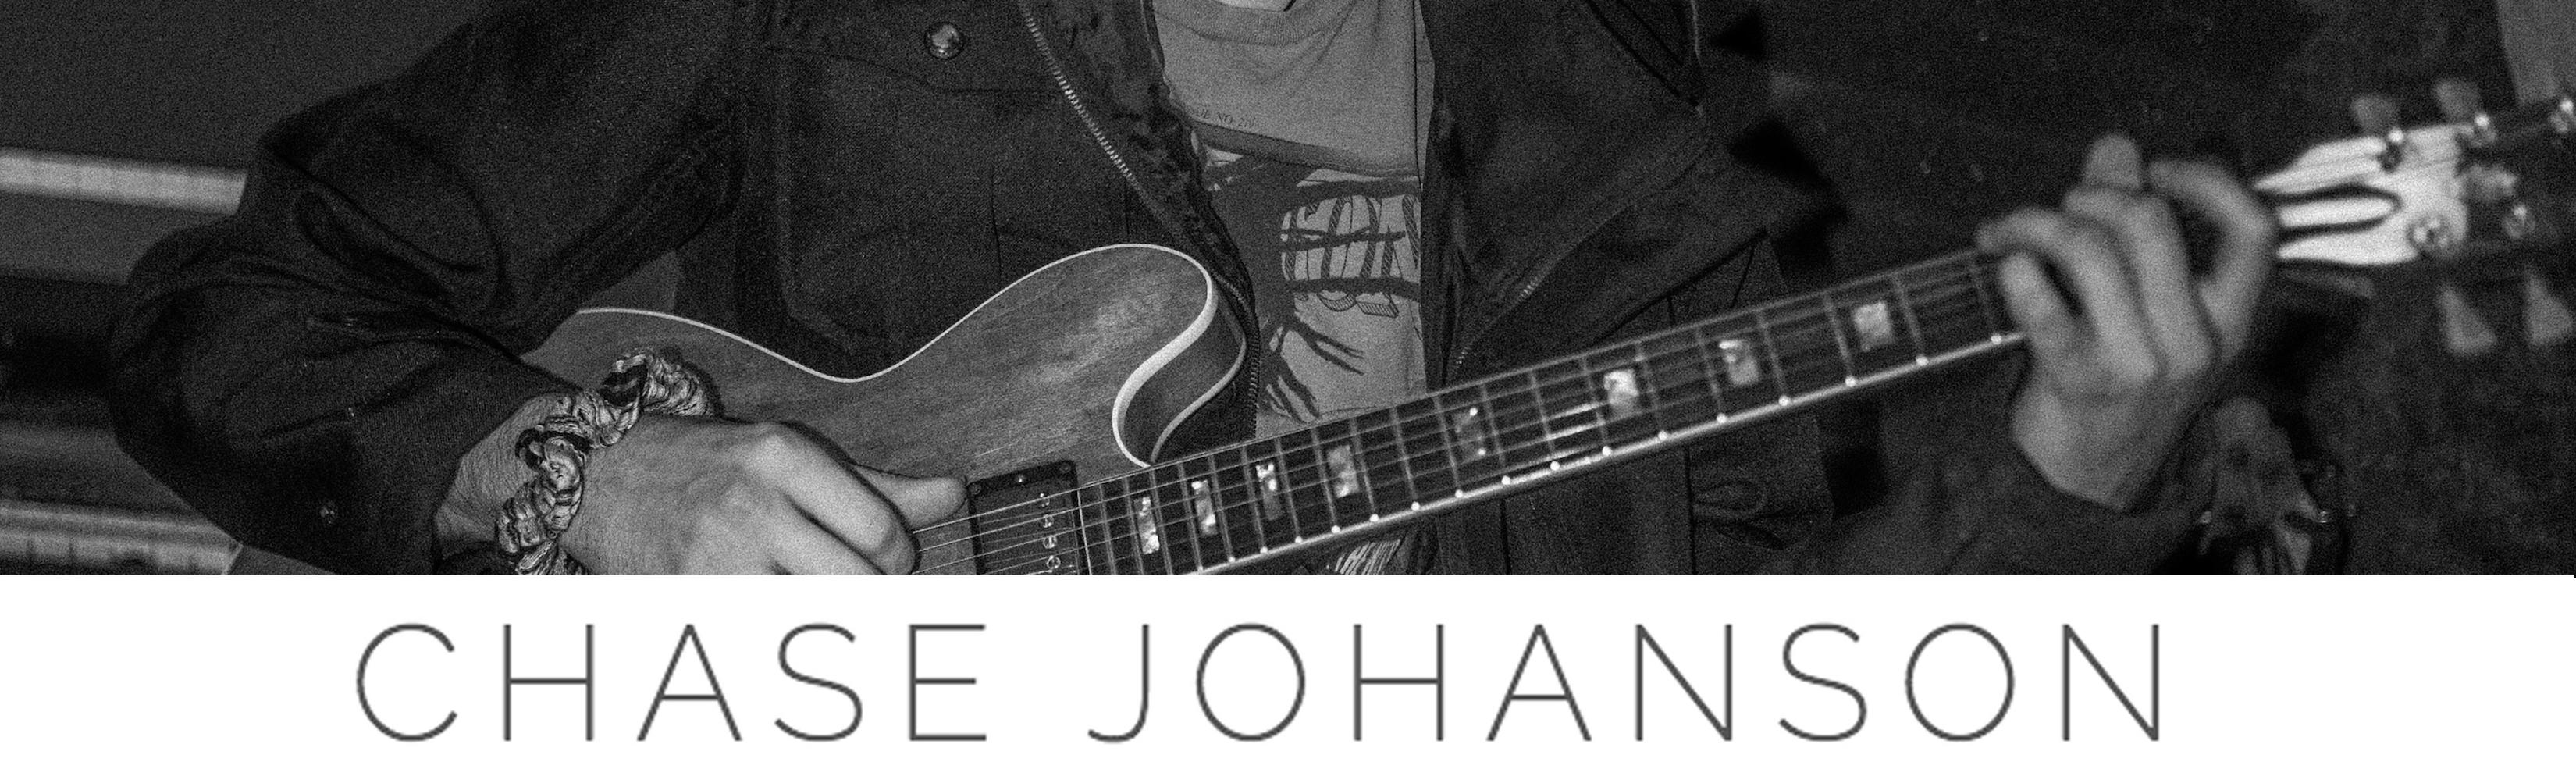 Chase Johanson